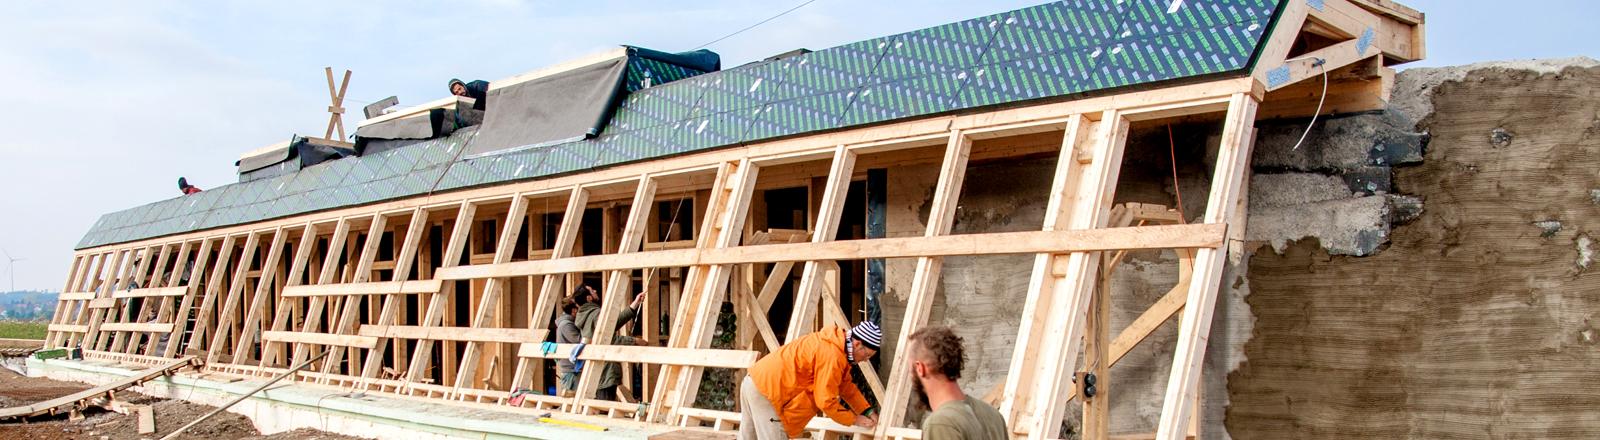 Männer an der Baustelle das Earthship-Hauses in Tempelhof.